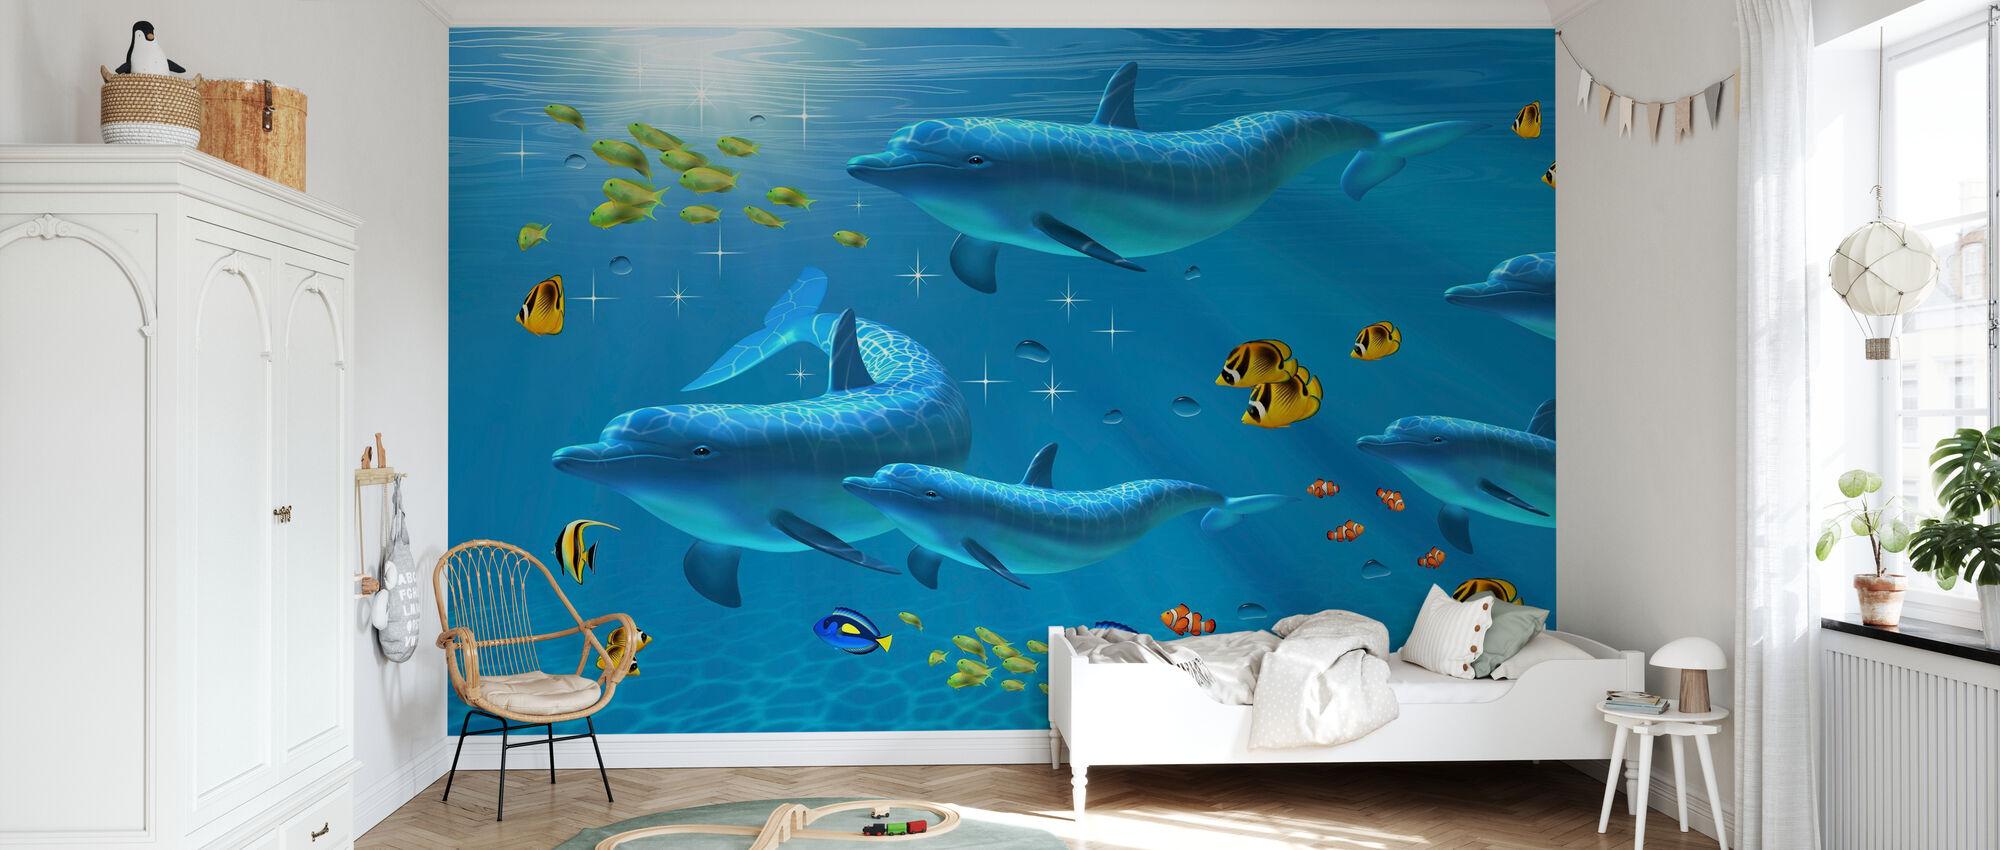 Rainbow of Color - Wallpaper - Kids Room